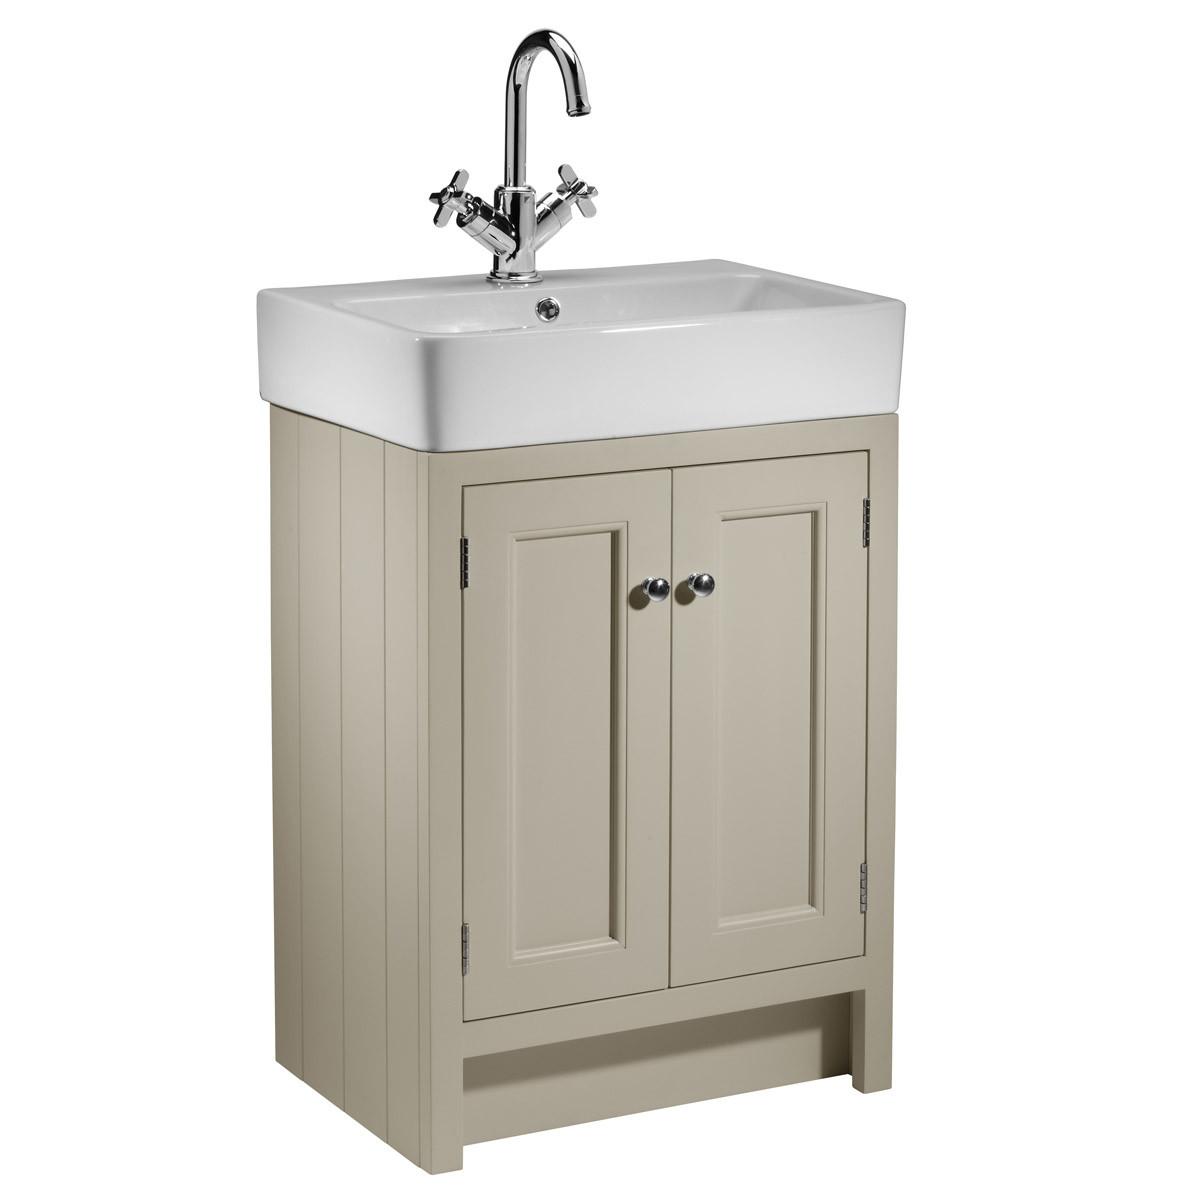 Free standing bathroom storage furniture - Home Bathroom Furniture Roper Rhodes Bathroom Furniture Roper